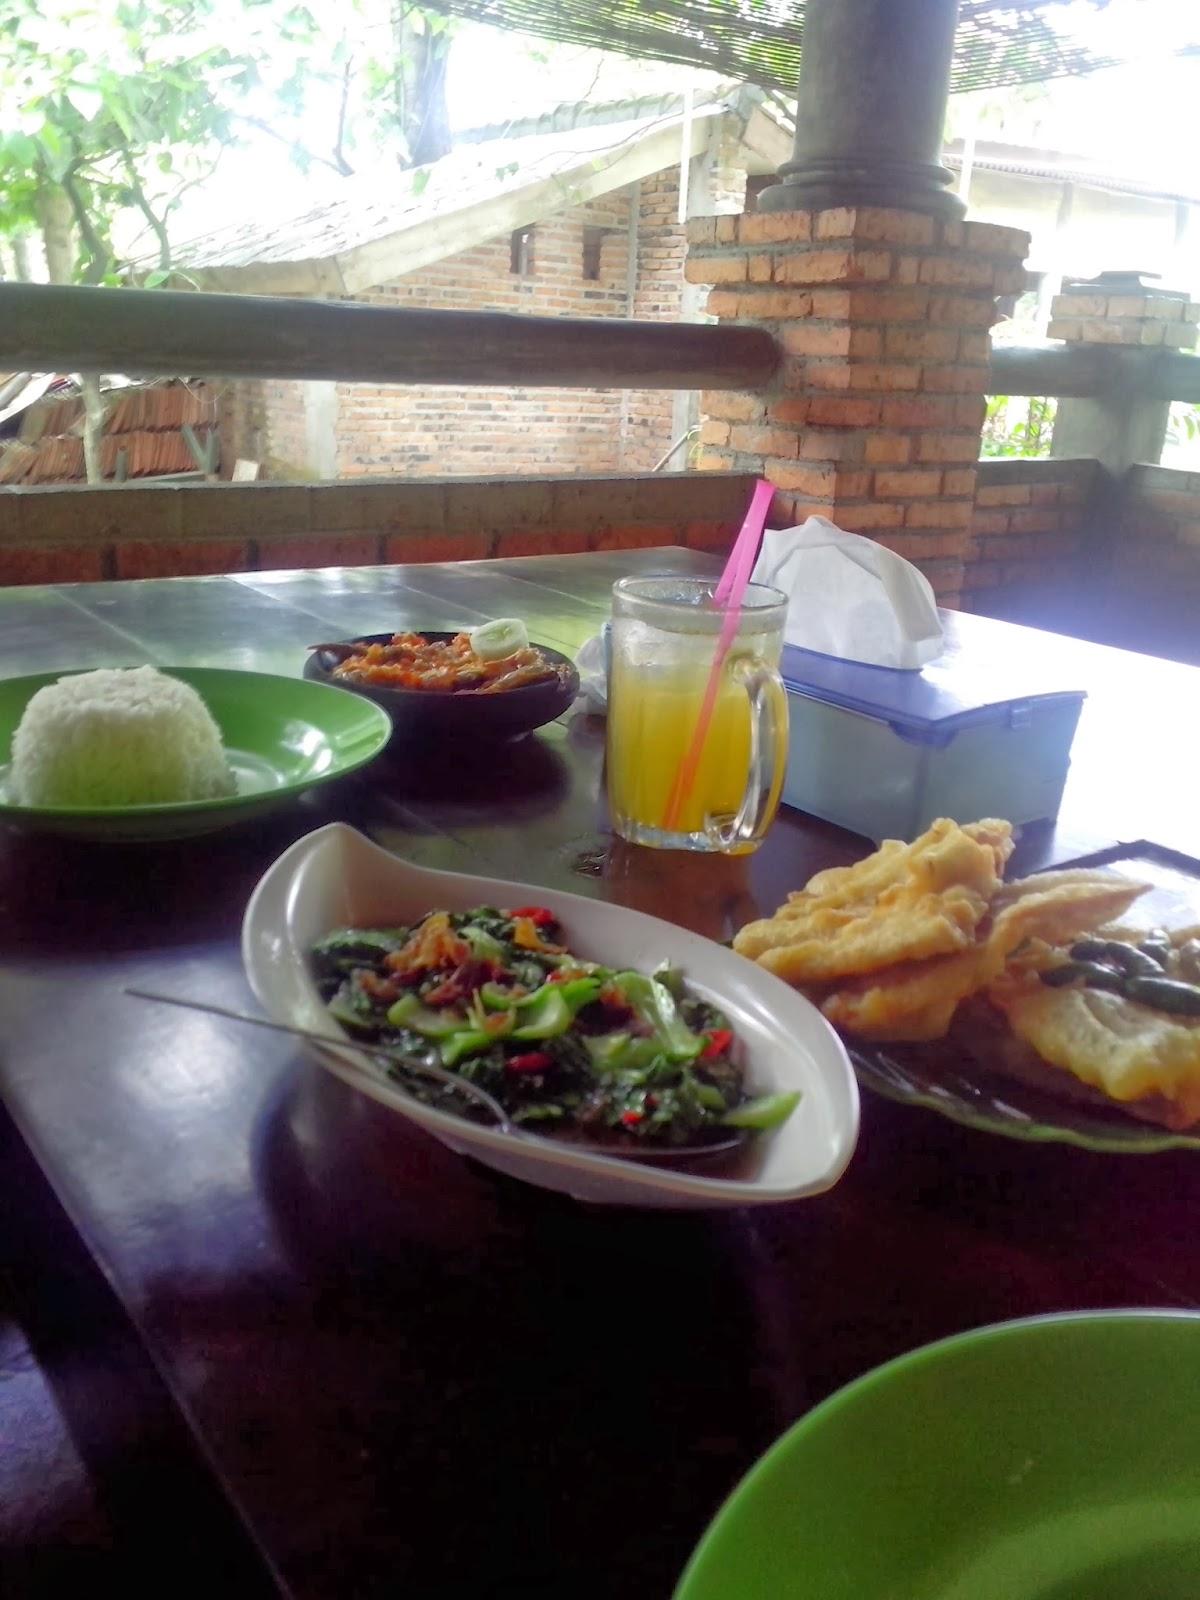 tempat makan yang enak di depok ala urang rh alaurang com